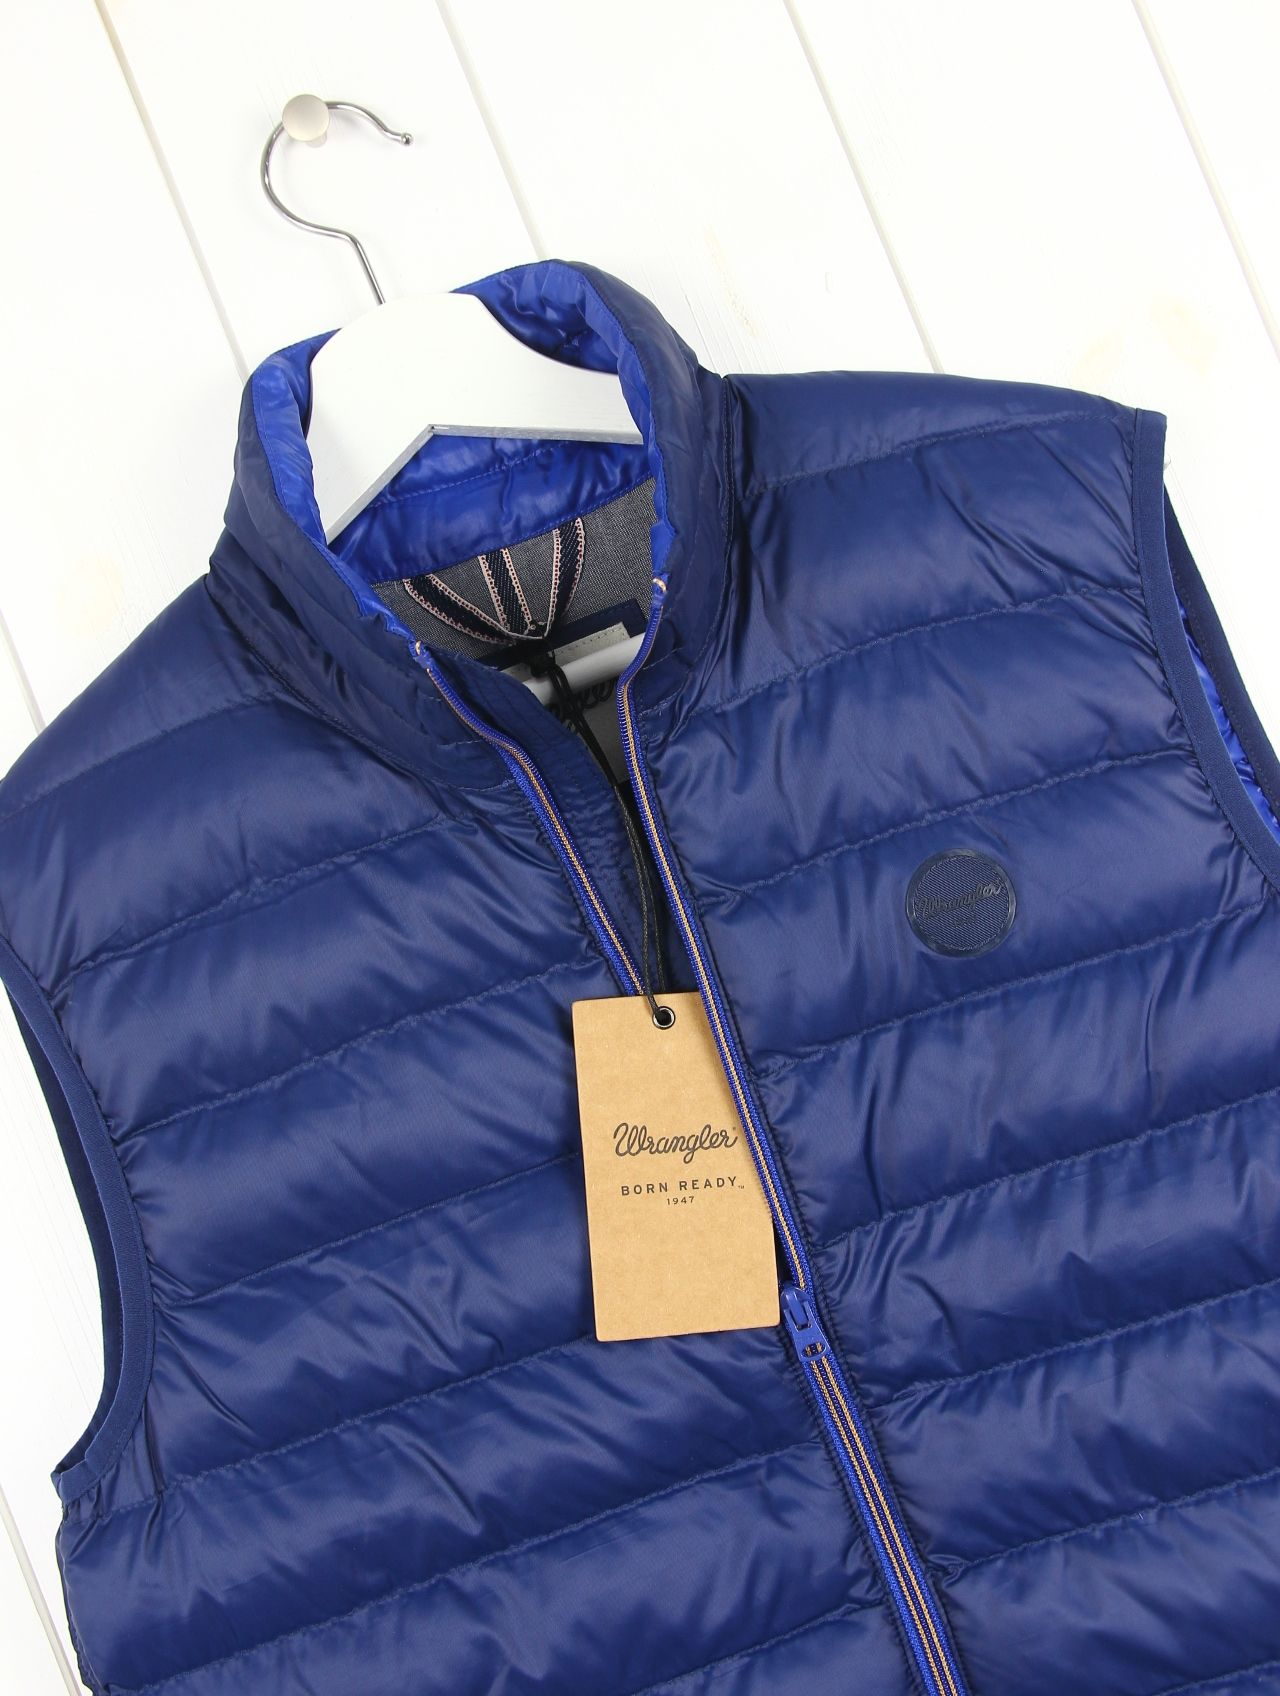 Wrangler Sherpa Jacket Born Ready Blue Giacca Uomo